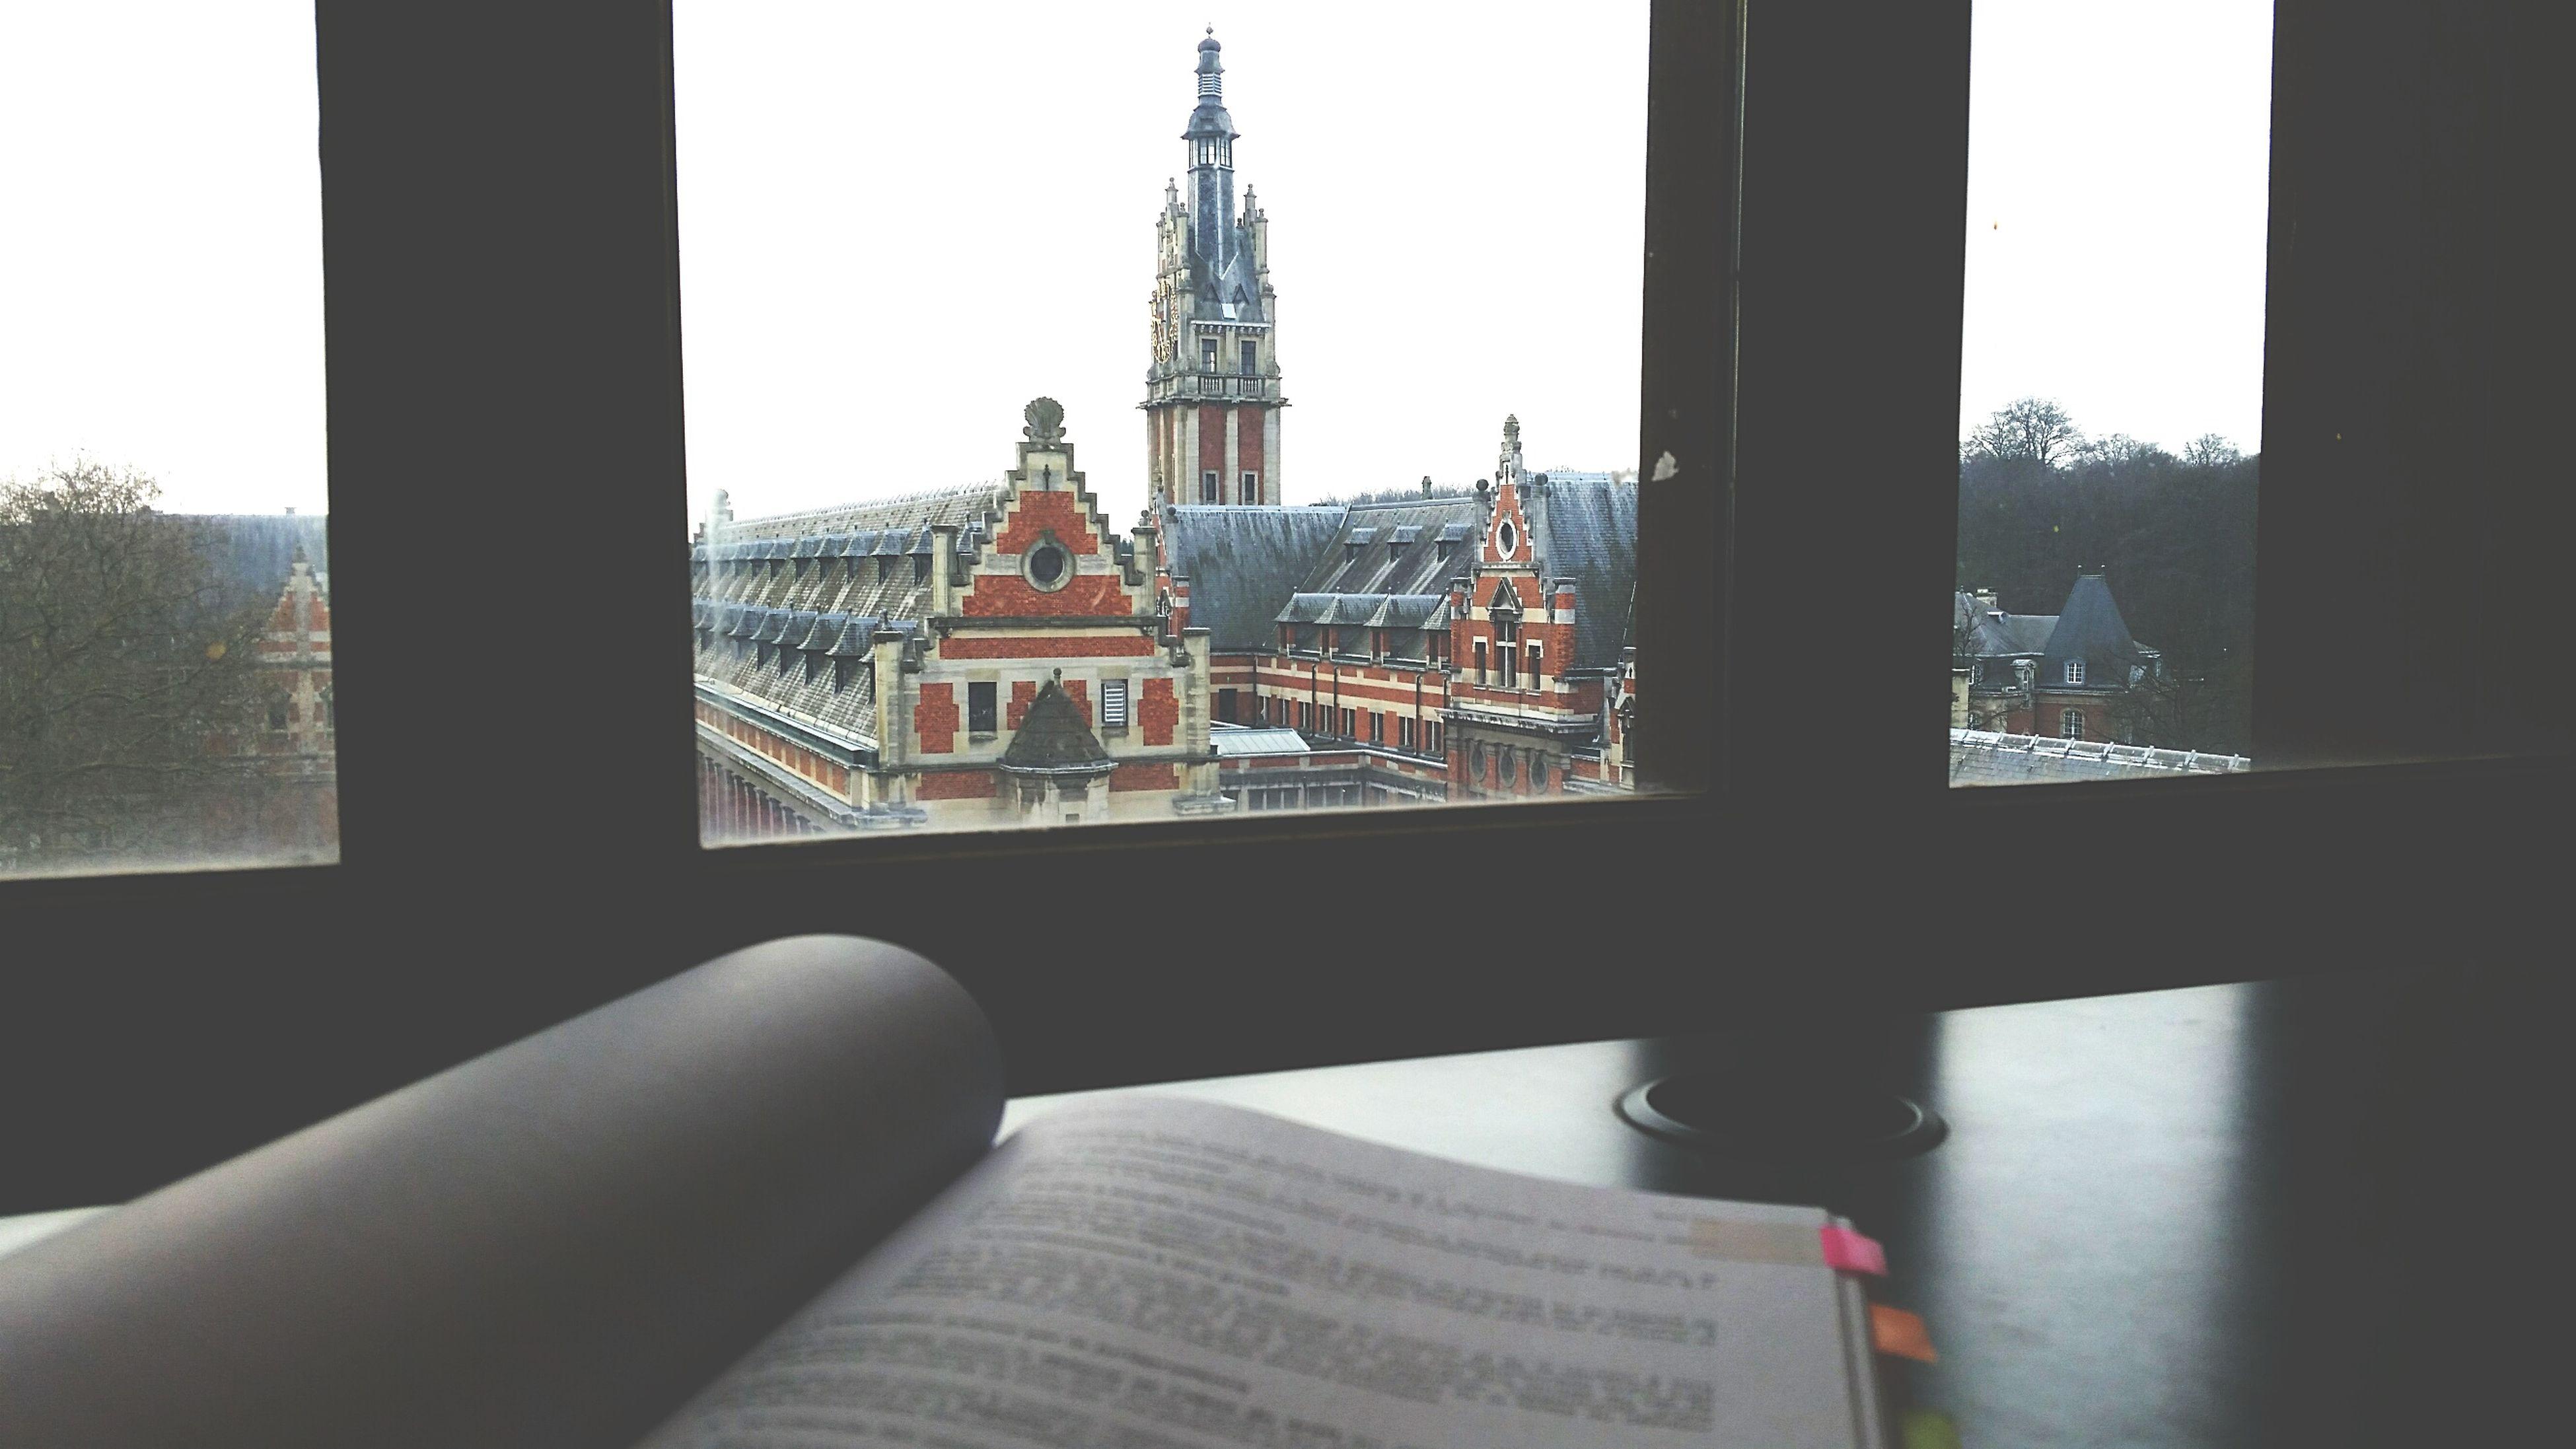 Morning Studying Lawschool